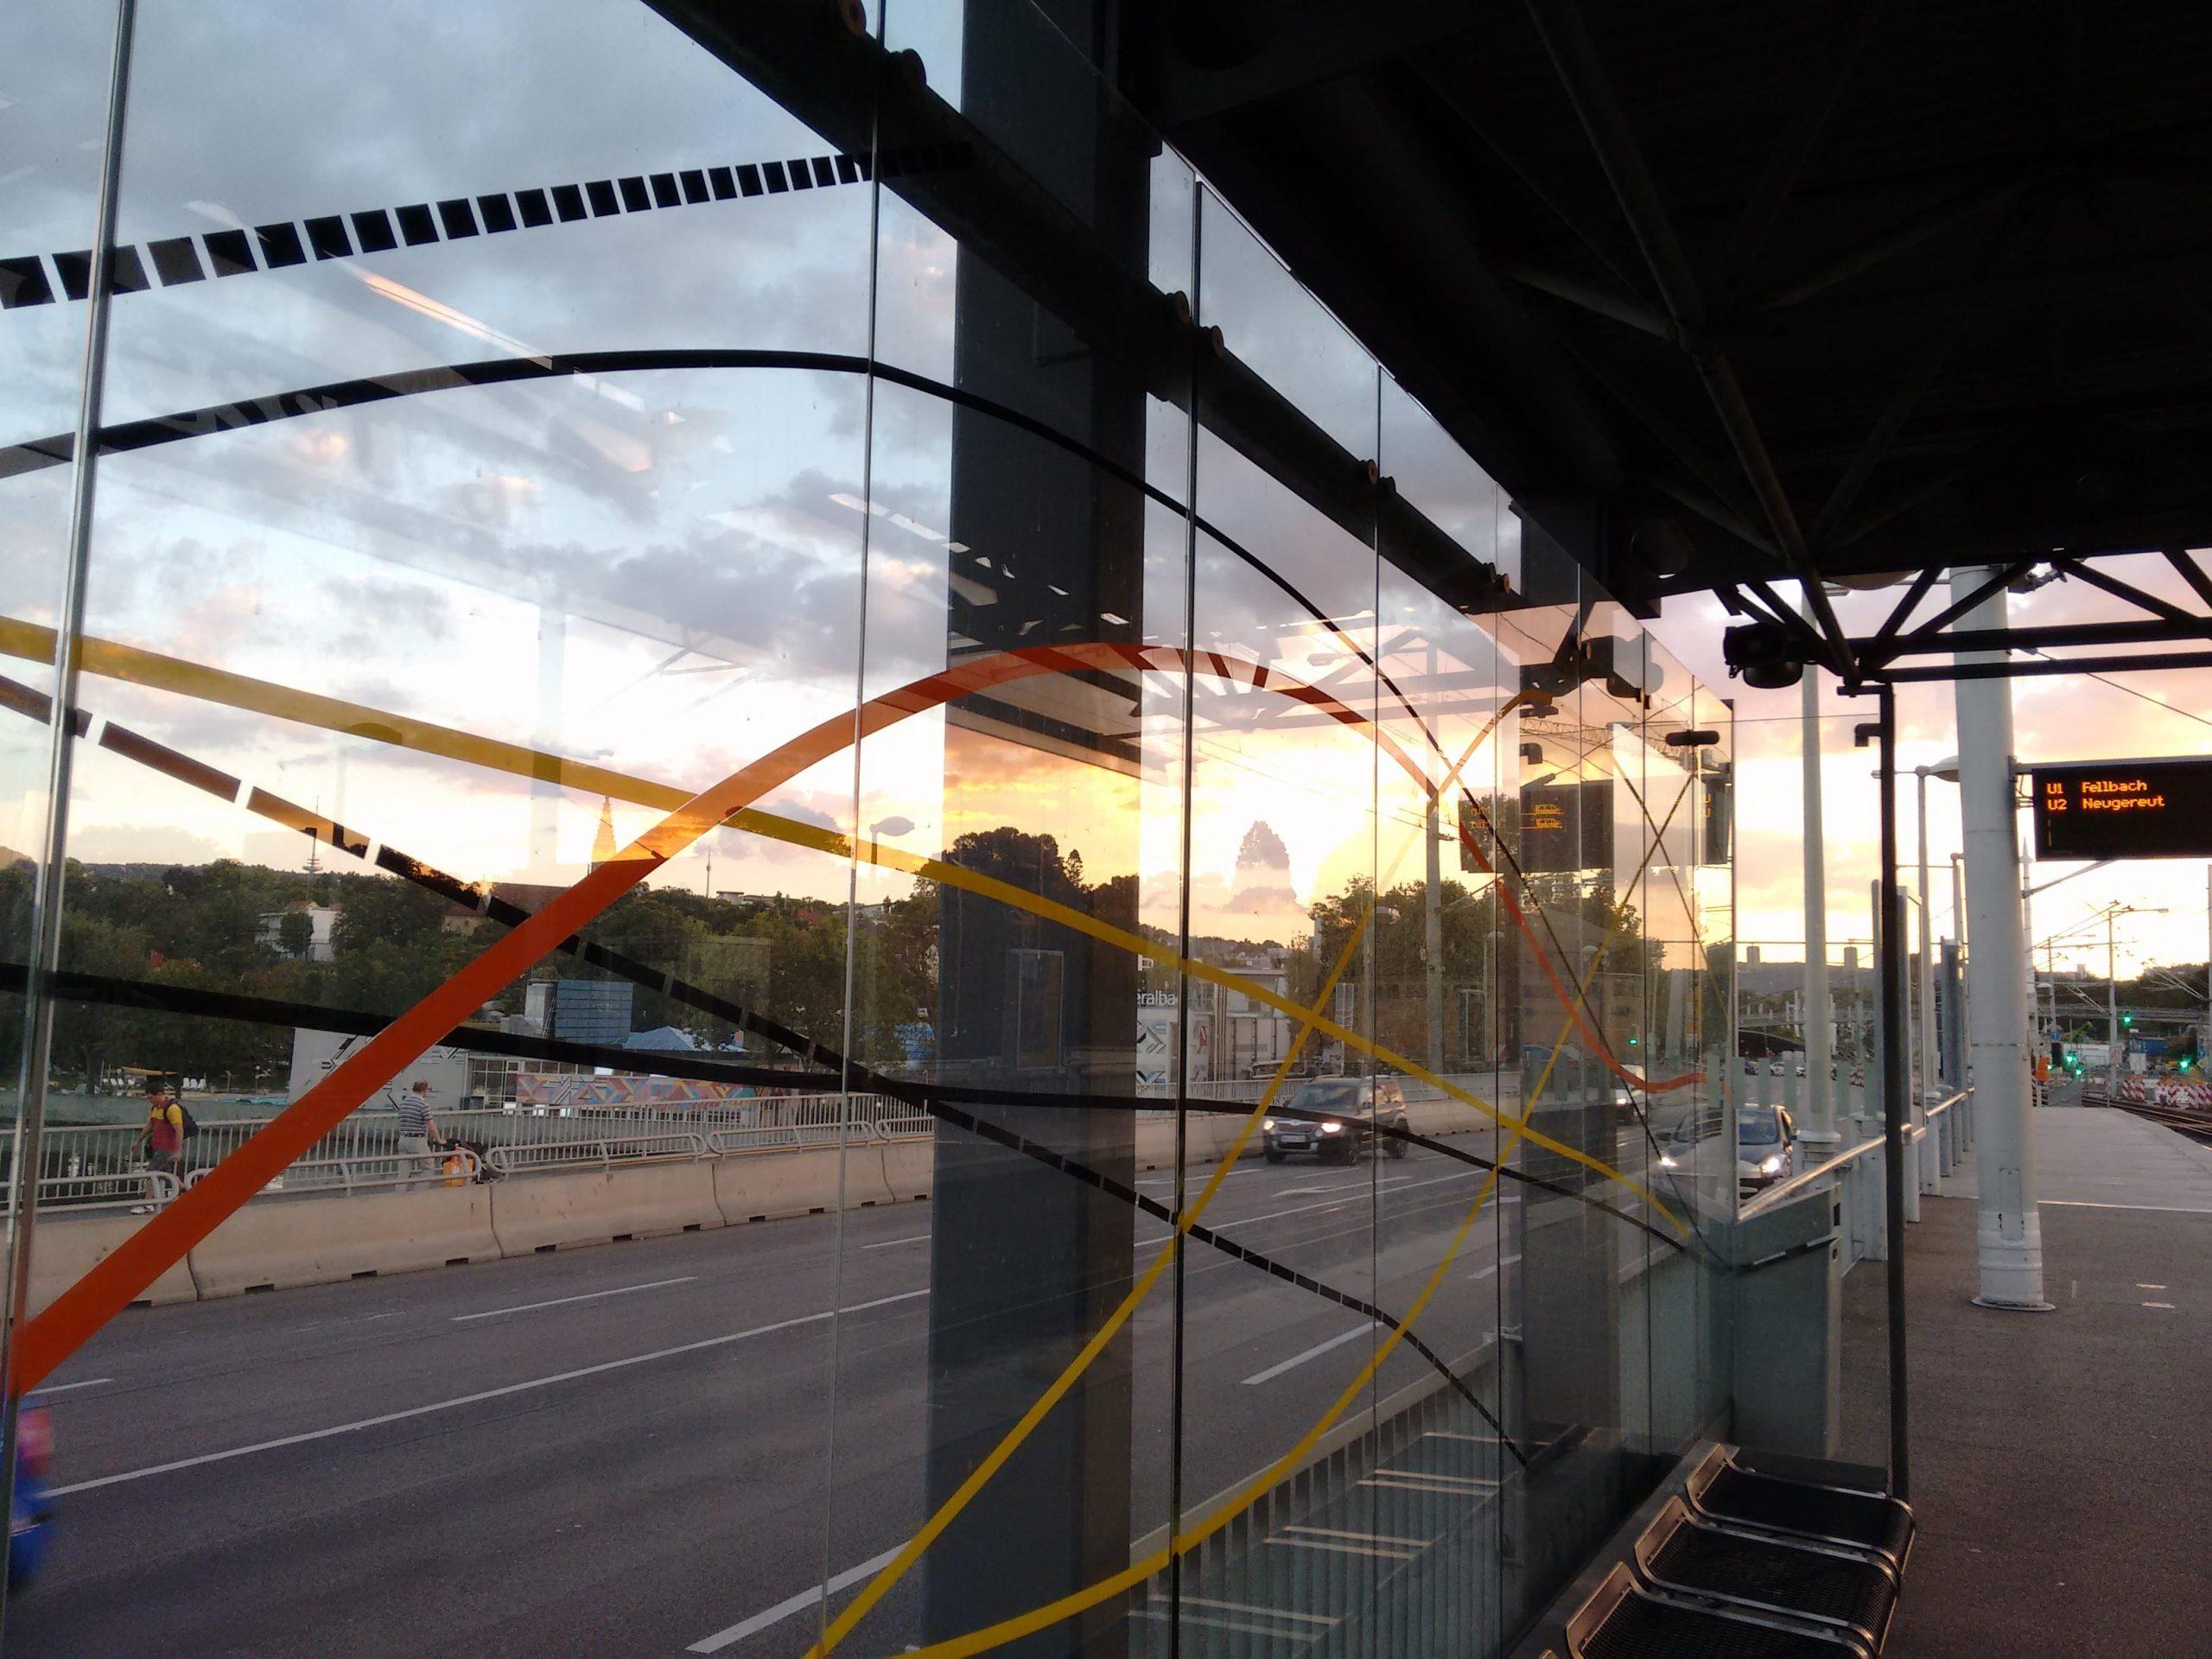 Reflection, stopping point, subway, Stuttgart